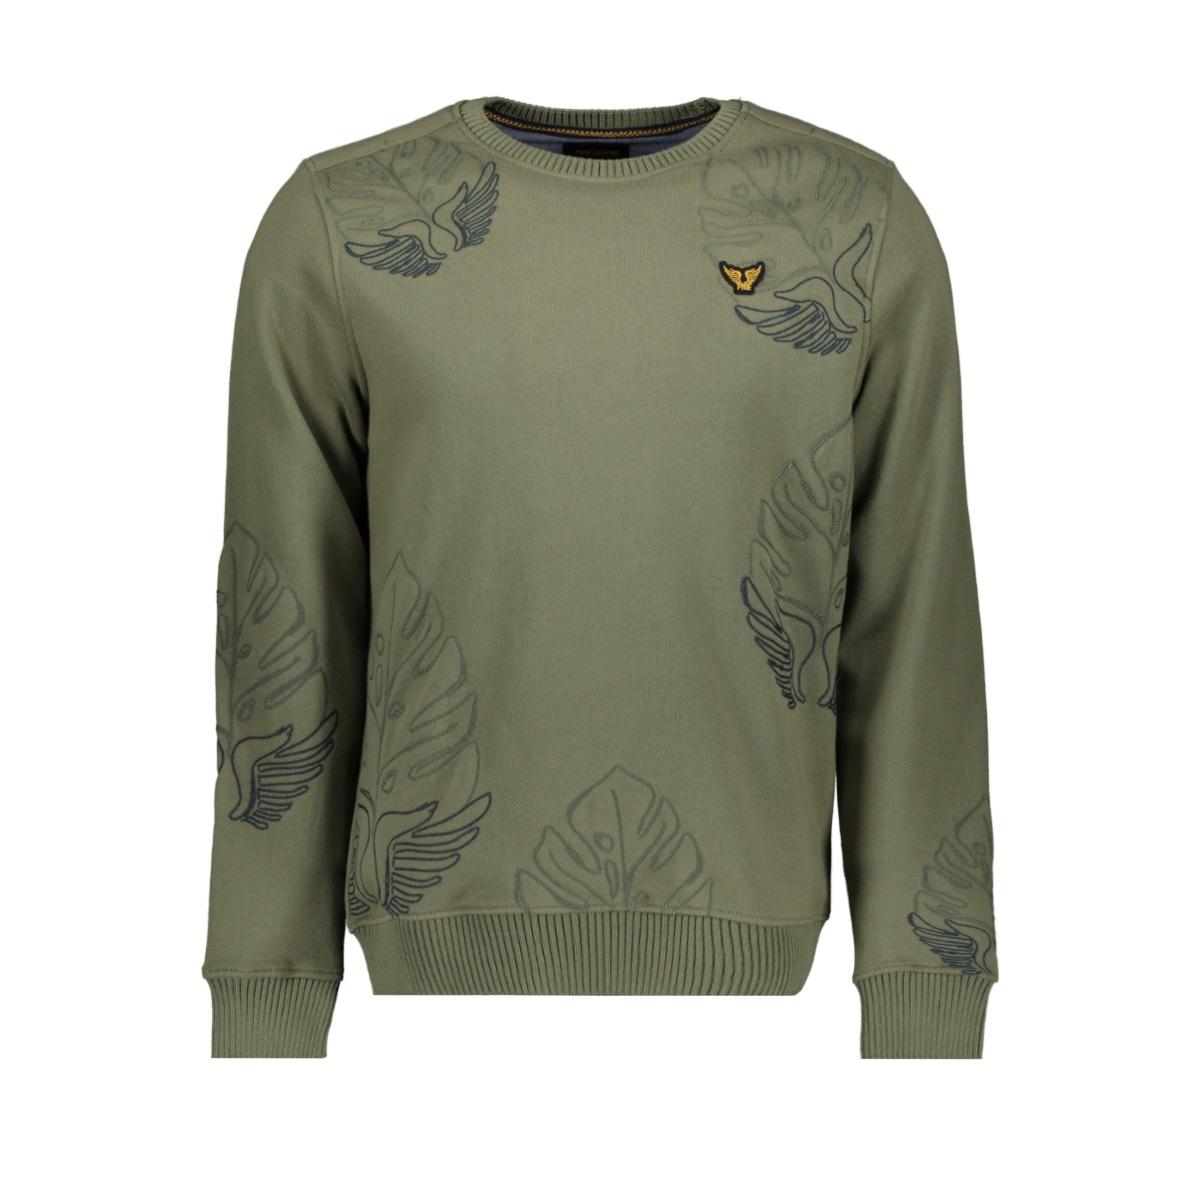 crewneck sweat psw201405 pme legend sweater 6149